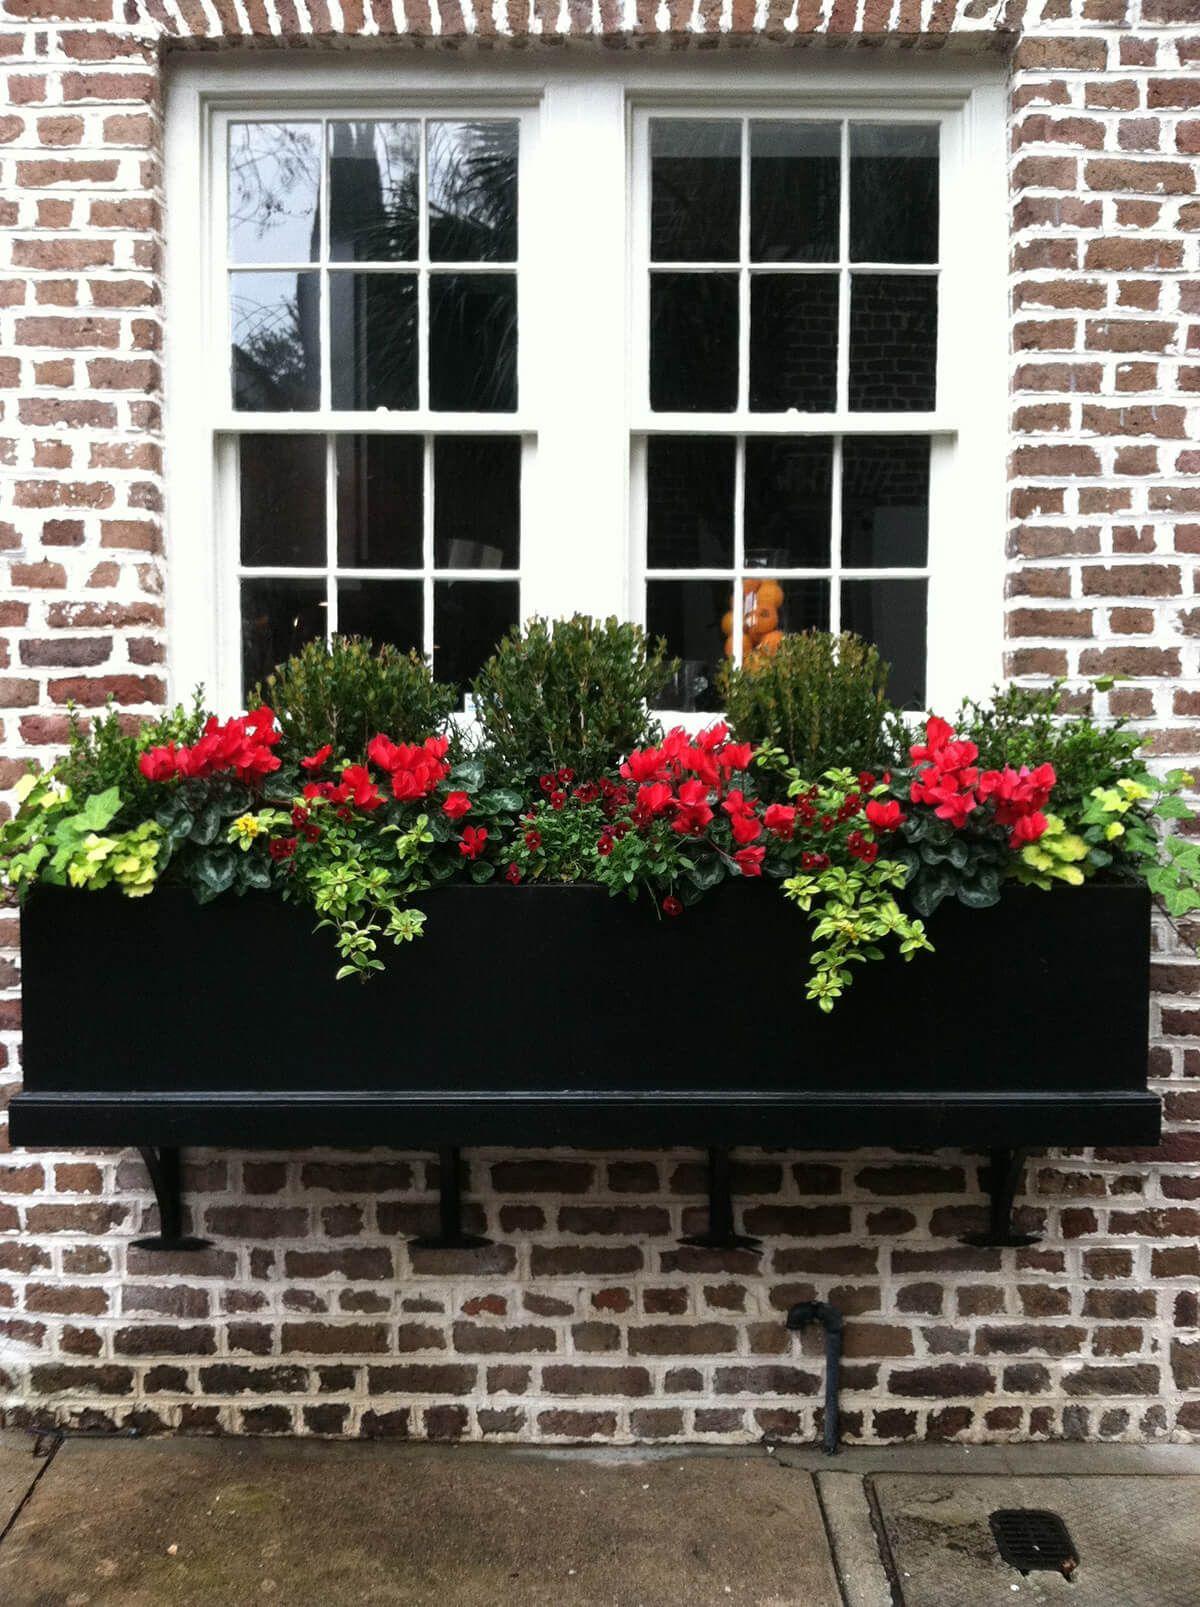 Country Traditional Blackonbrick Flower Box Window box